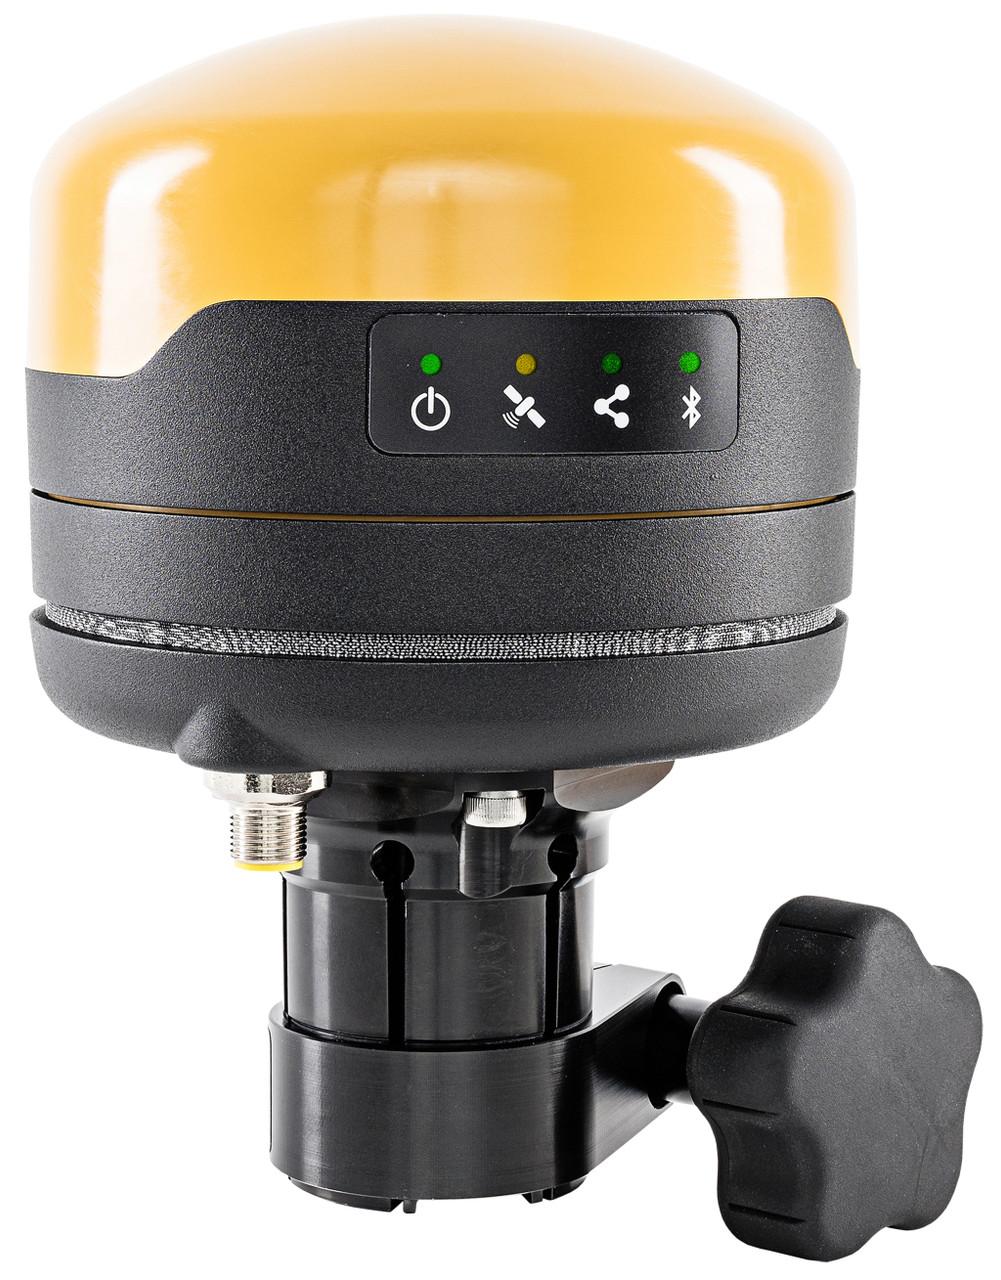 Topcon X-53x Automatic Excavator GPS System